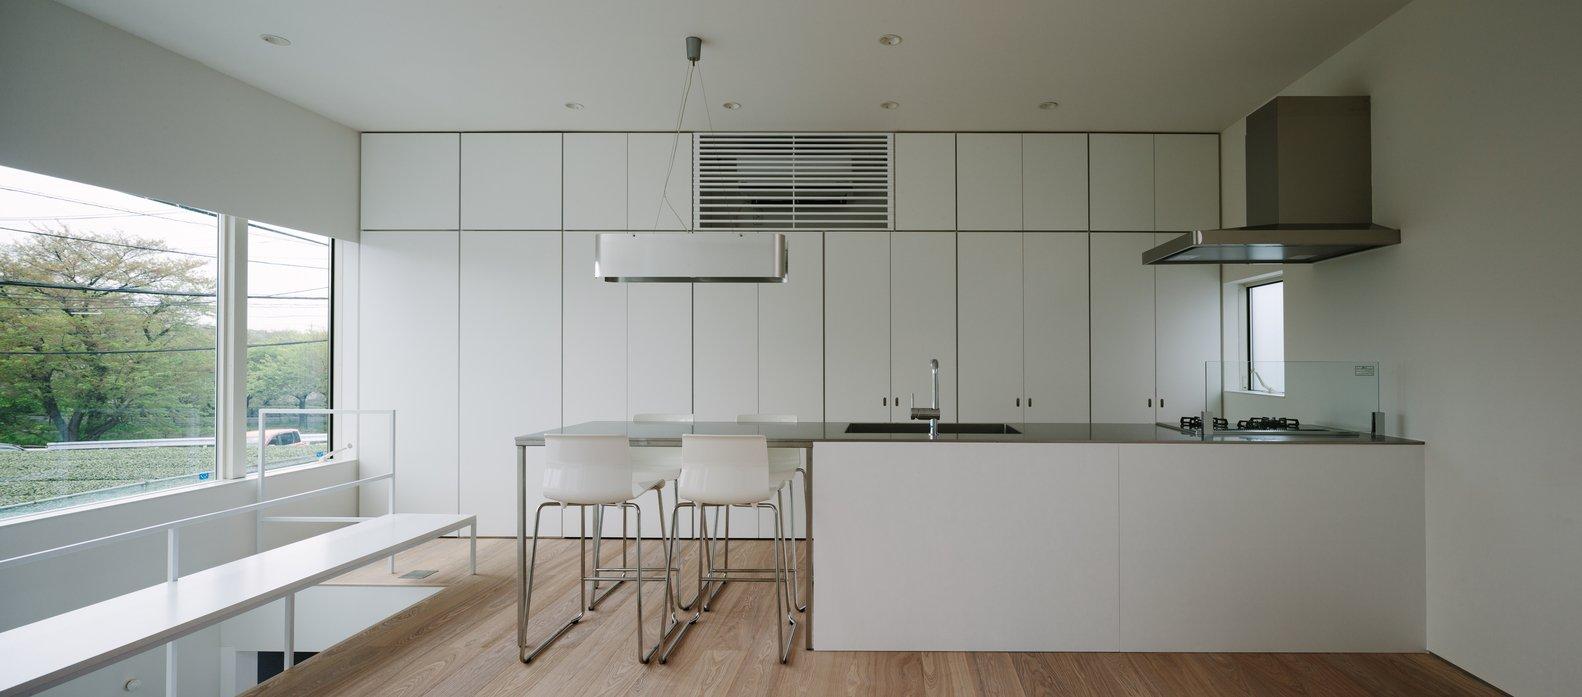 Kitchen, Granite, White, Light Hardwood, Recessed, Range Hood, and Range  Best Kitchen Light Hardwood Granite Photos